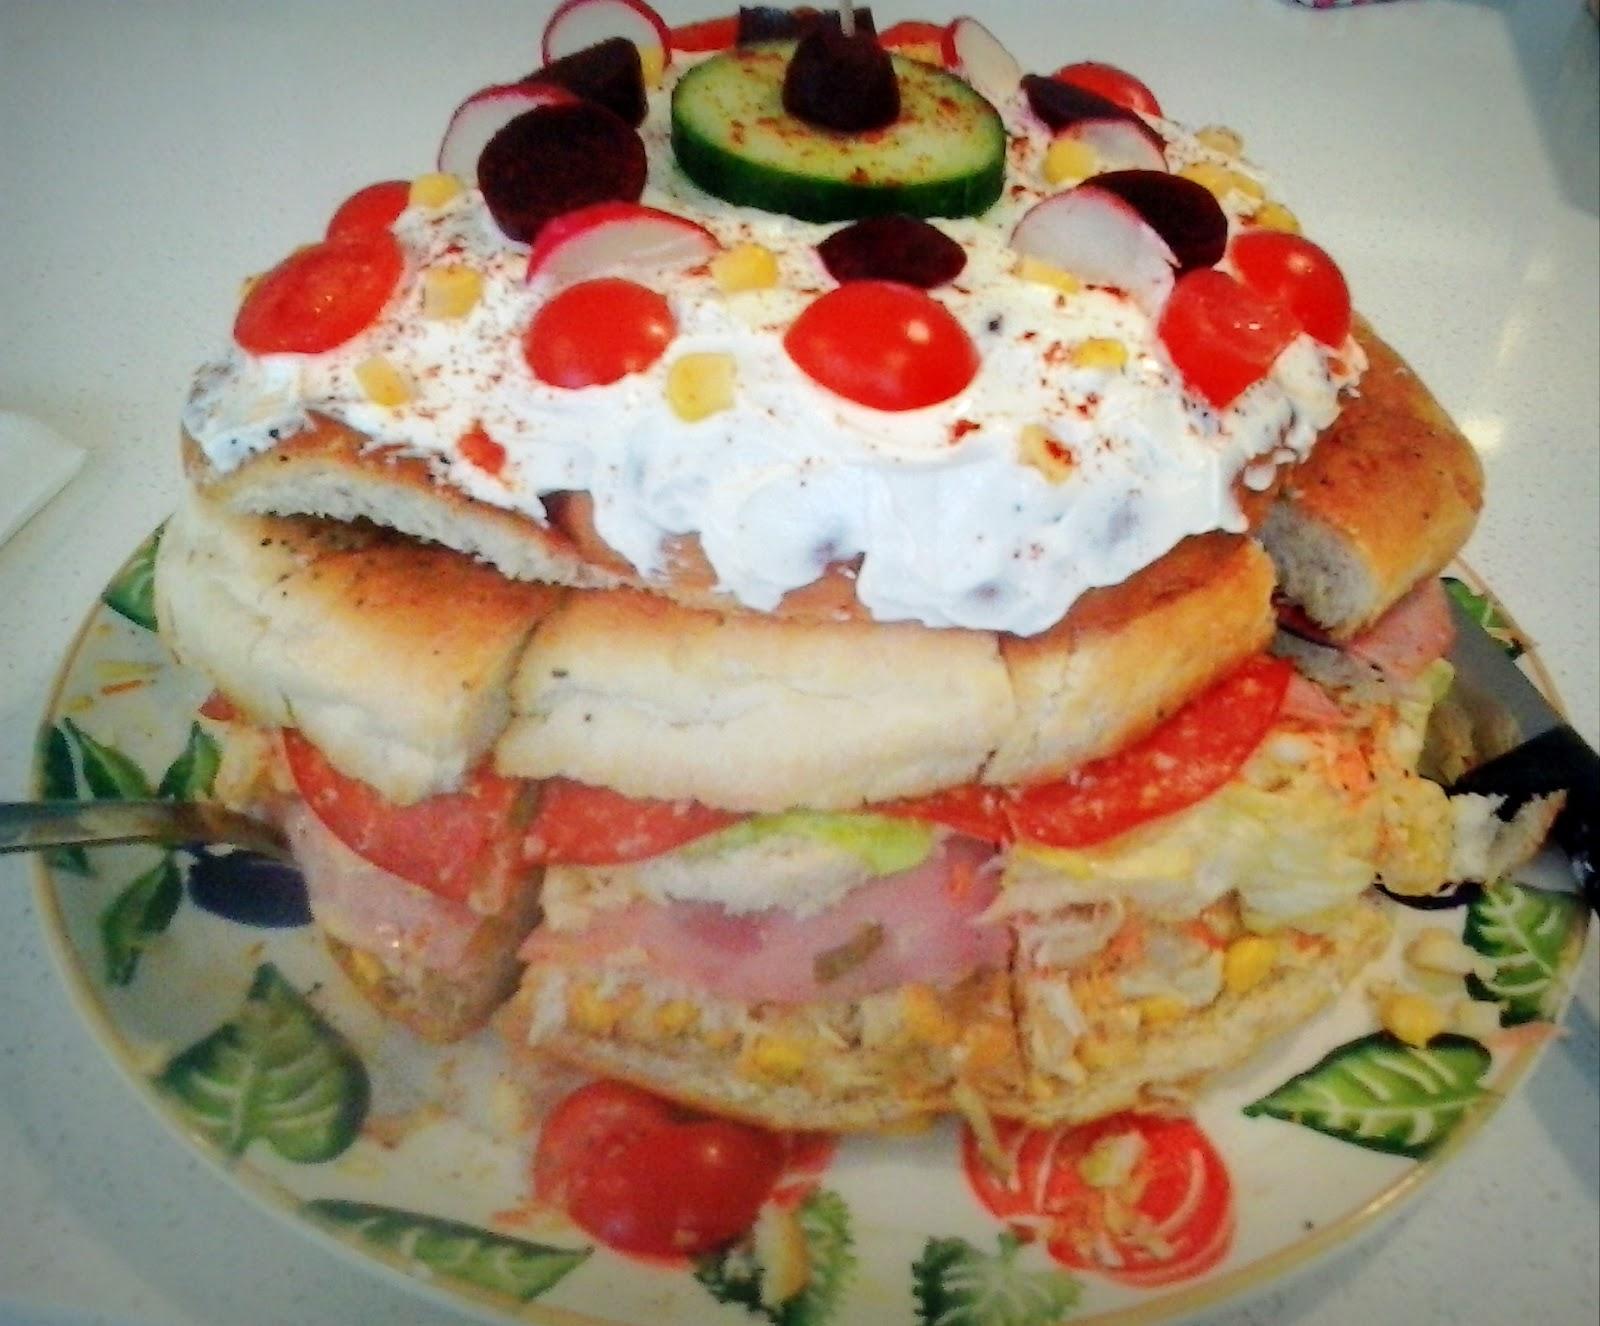 How To Make A Gaint Swedish Sandwich Cake